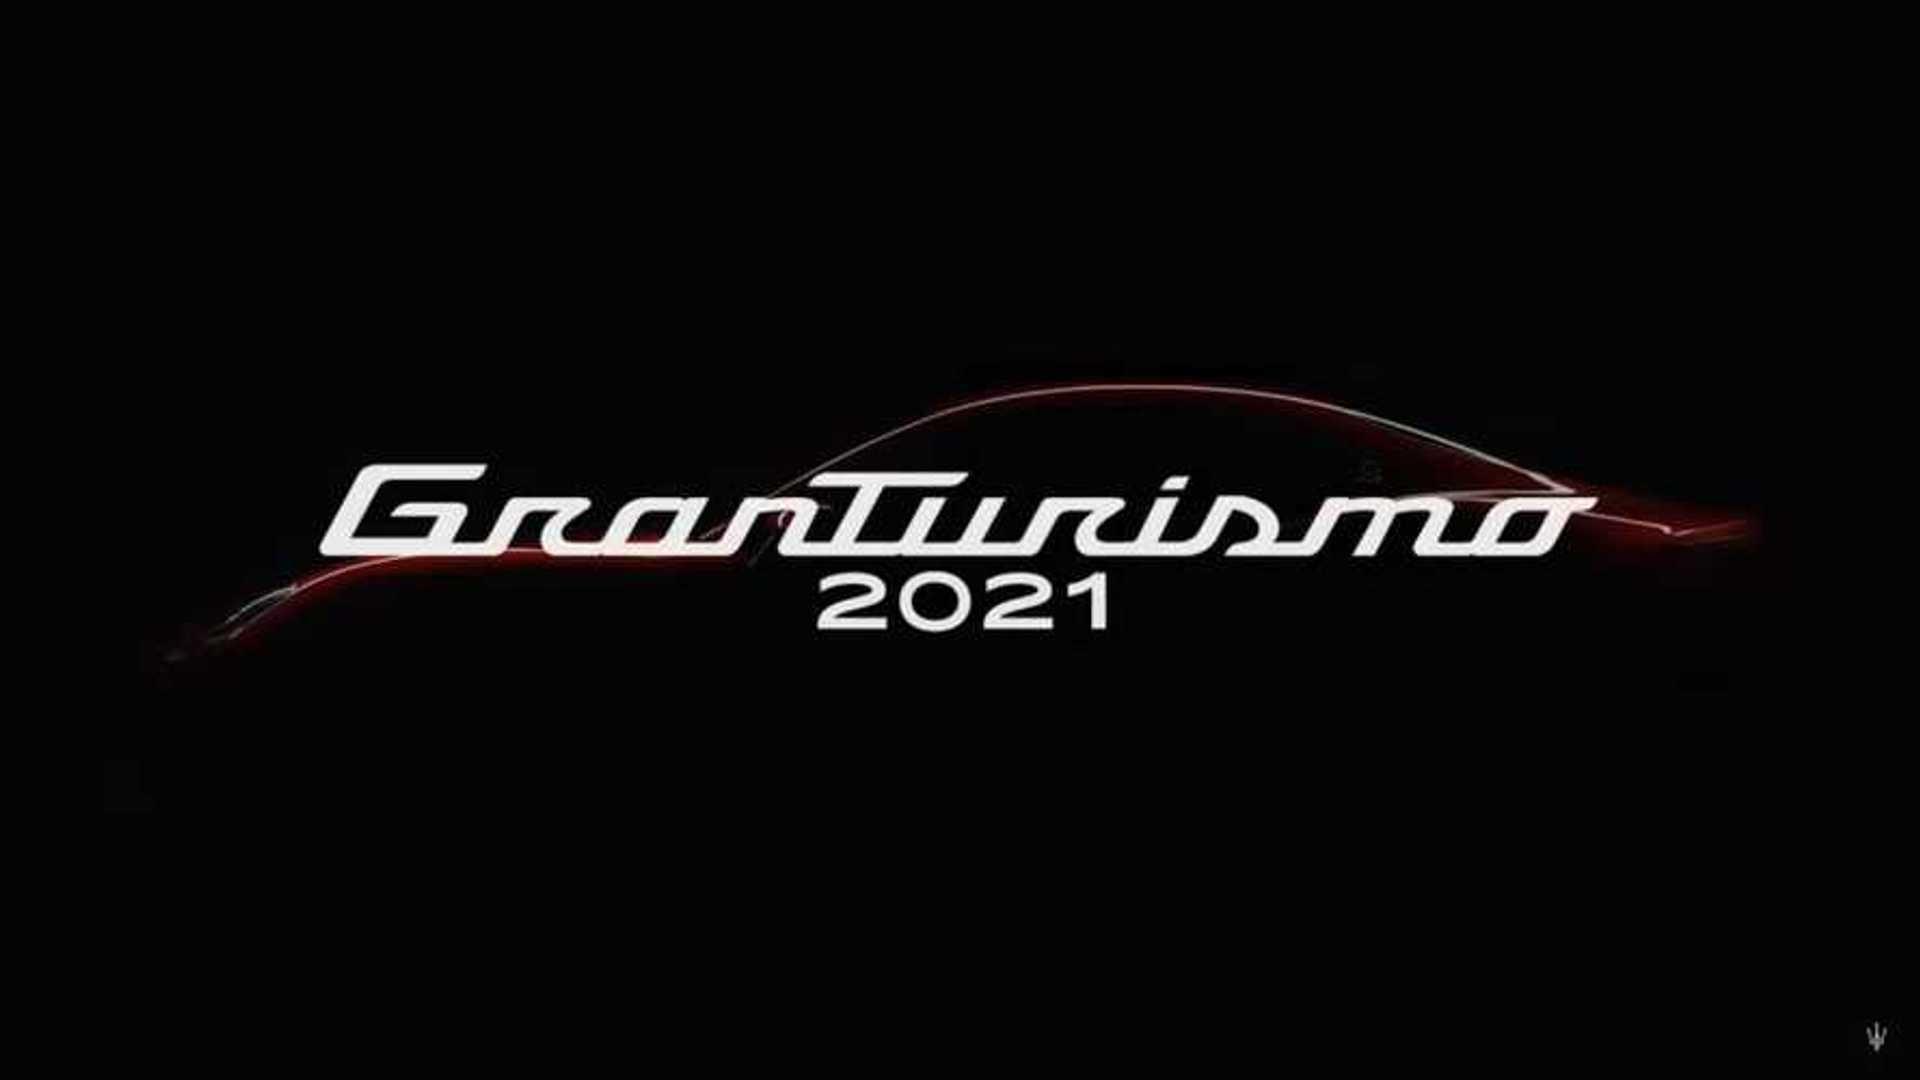 Teaser for new Maserati GranTurismo debuting in 2021 - Photo credit: Motor1/Maserati